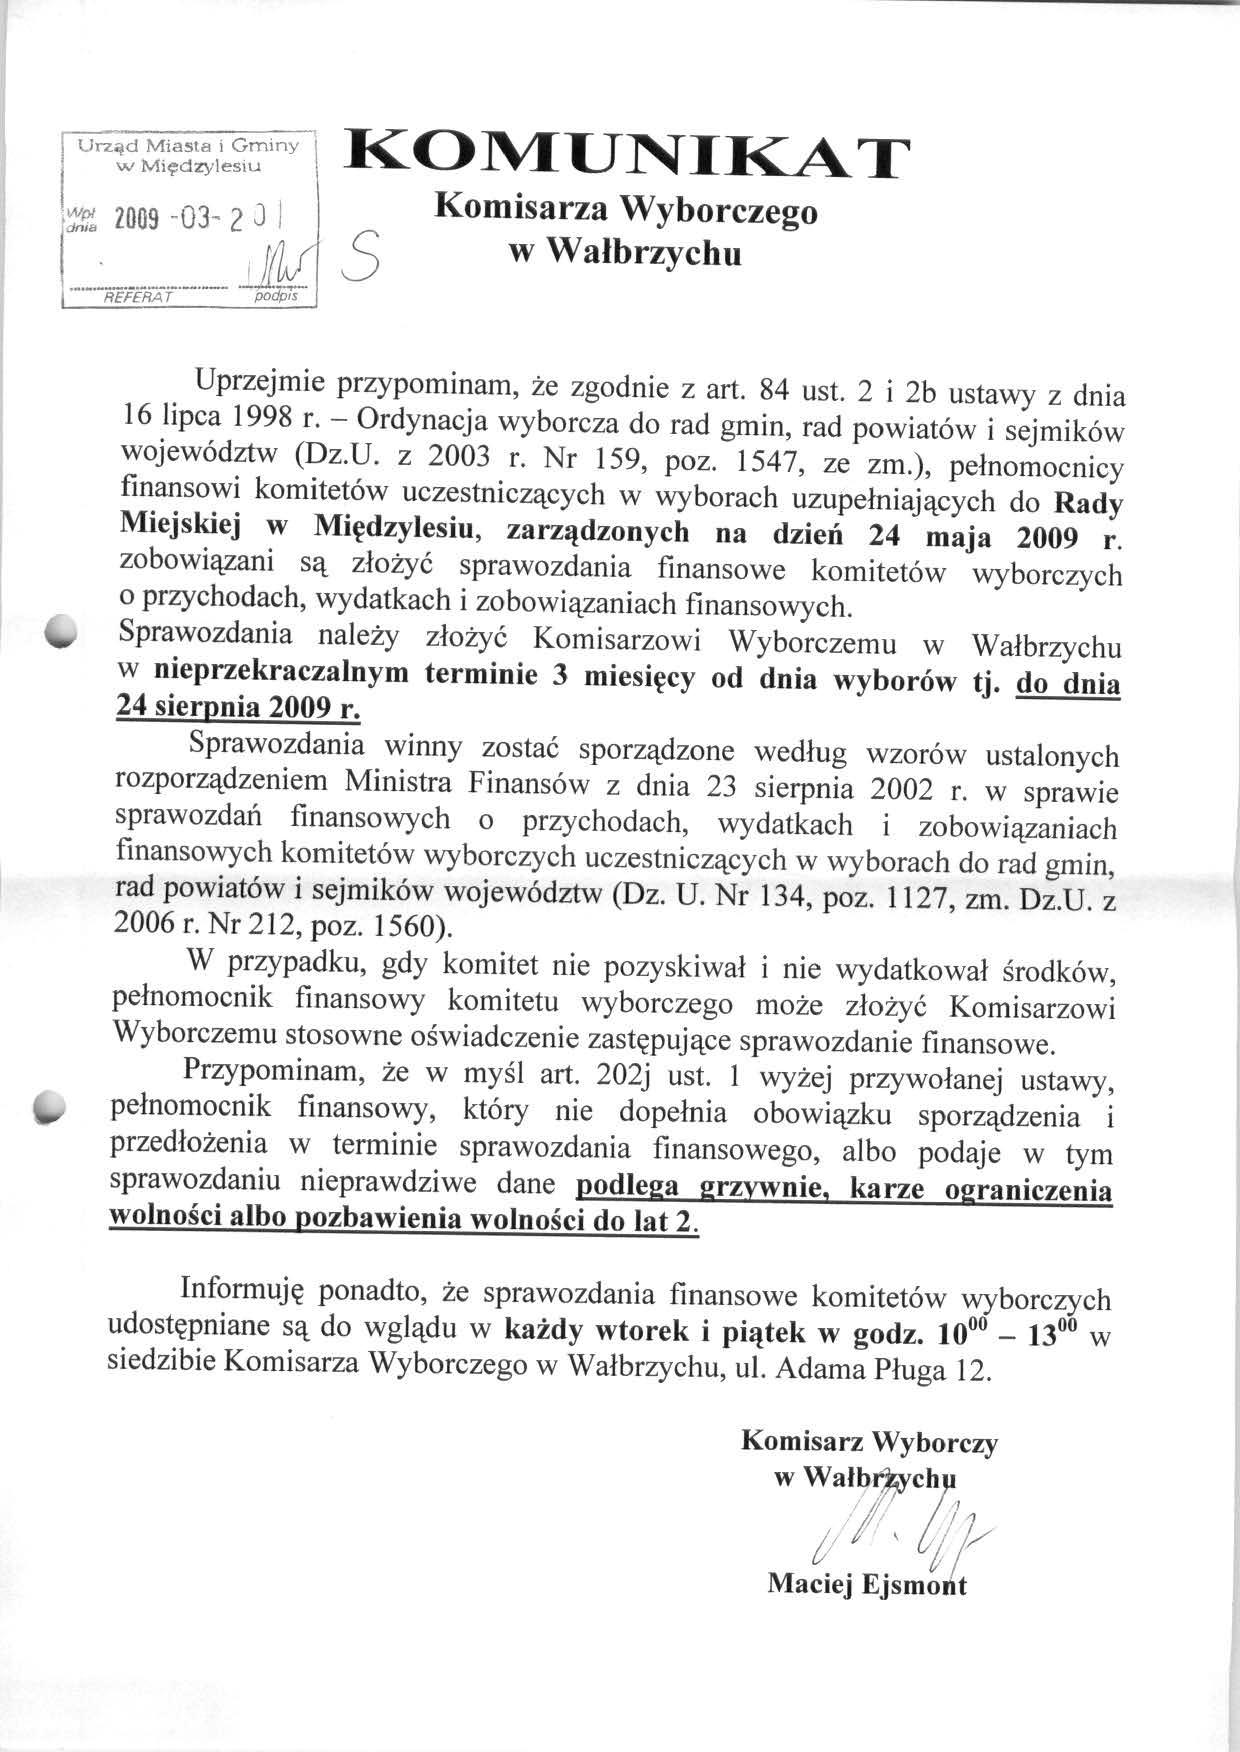 Komunikat Komisarza Wyborczego.jpeg